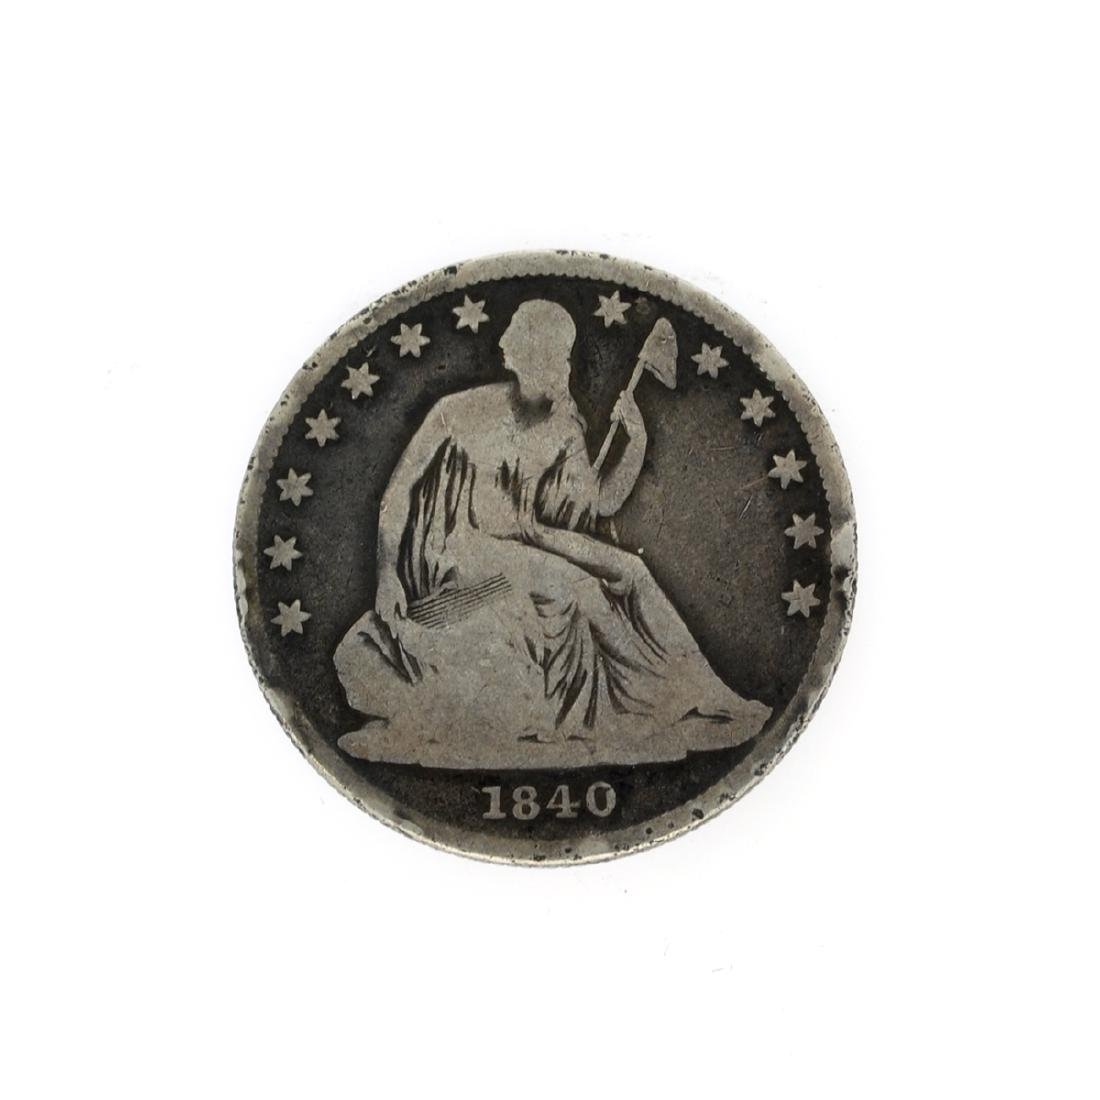 Rare 1840-O Liberty Seated Half Dollar Coin